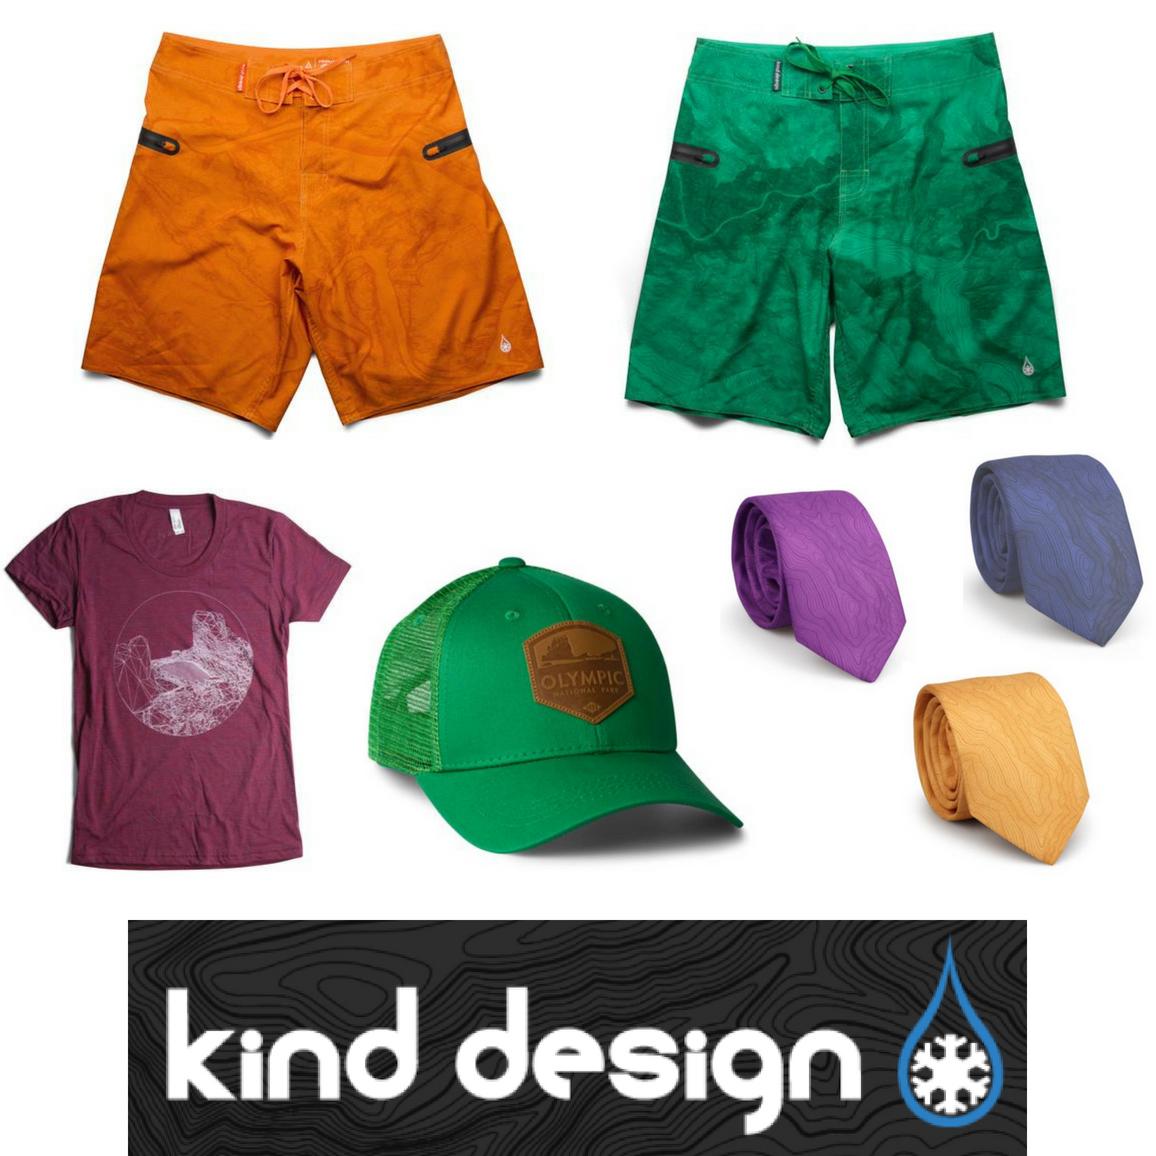 Kind Design brand image (1).jpg